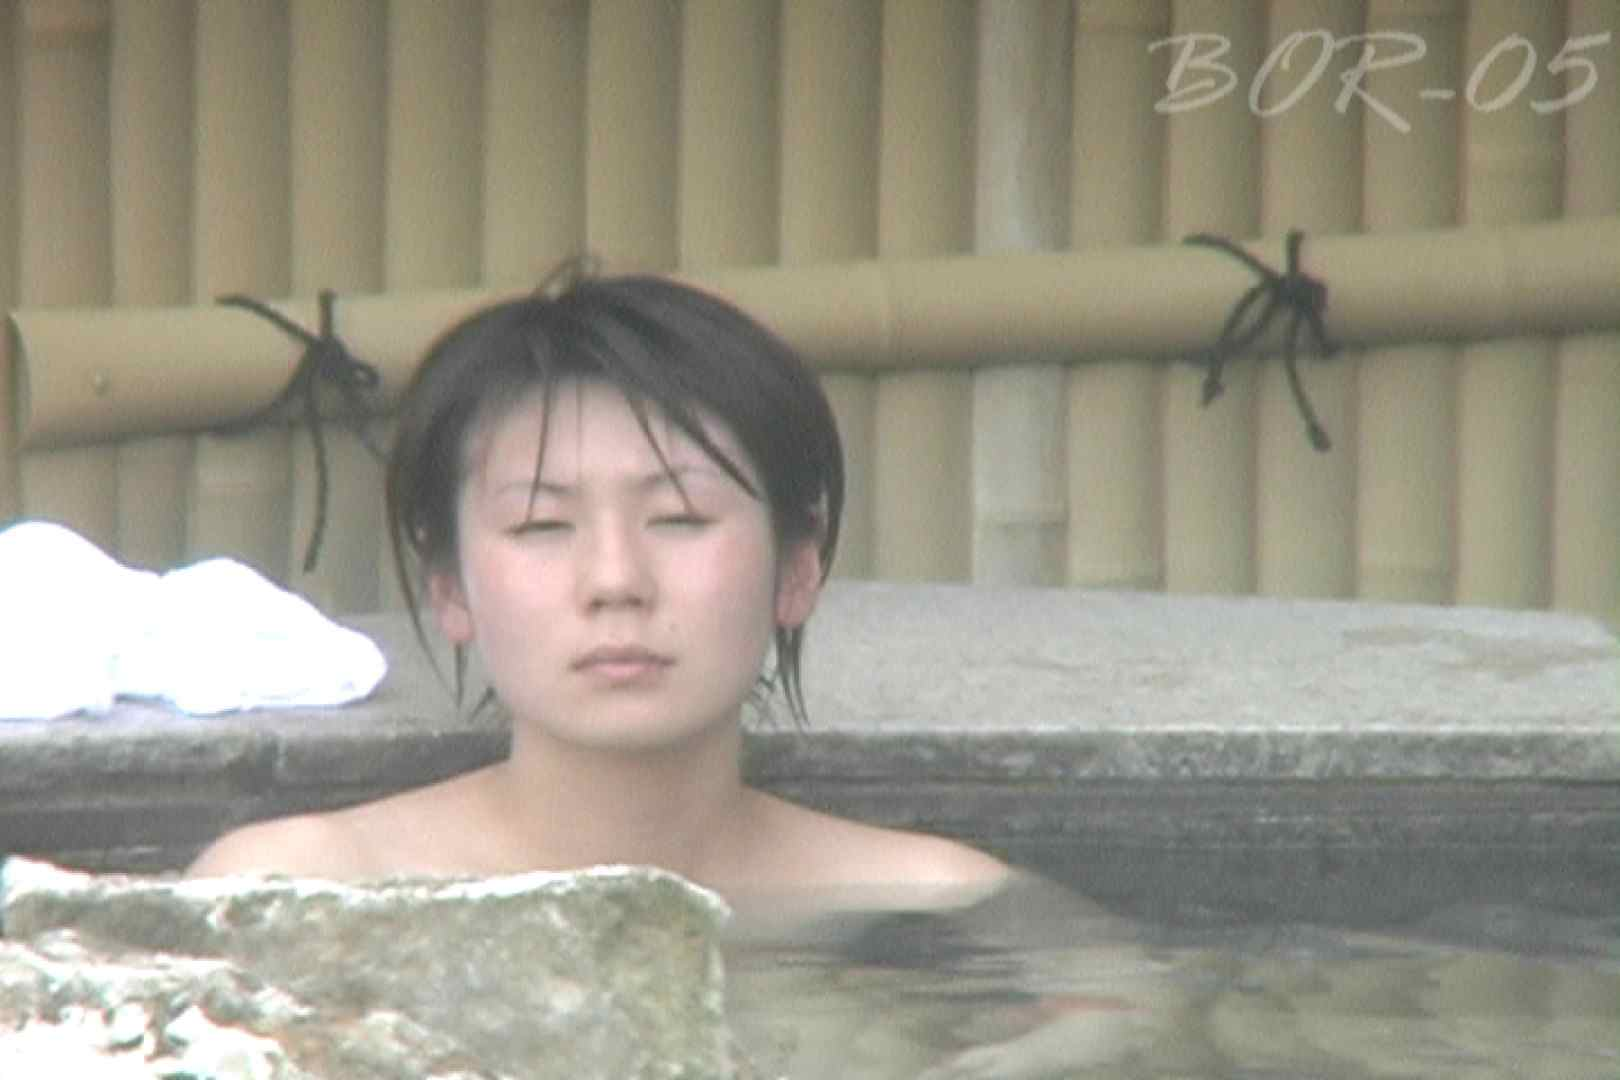 Aquaな露天風呂Vol.493 盗撮 AV無料動画キャプチャ 67PICs 44